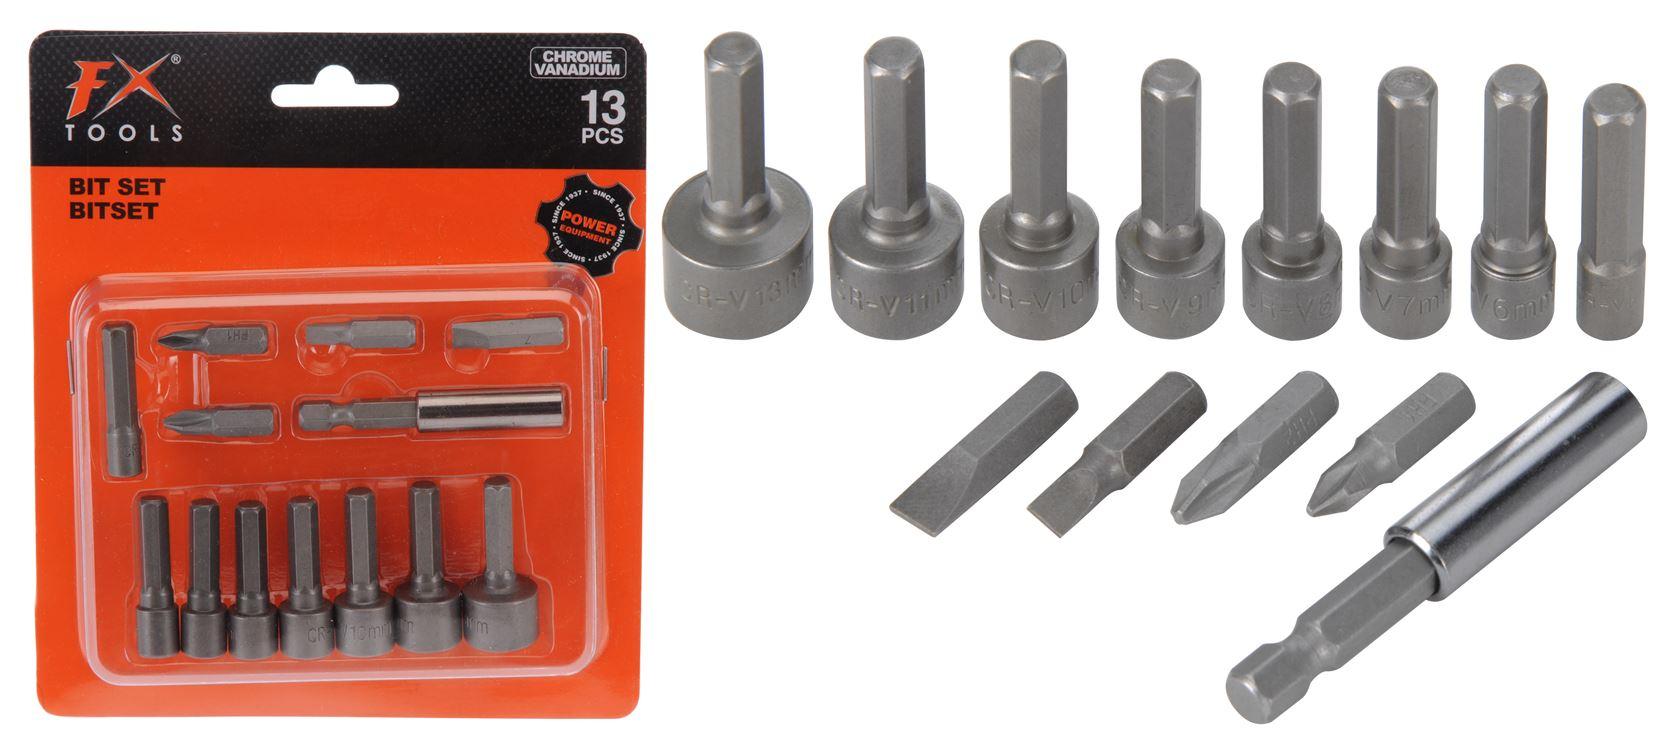 fx tools bitset chrome vanadium (13-dlg)